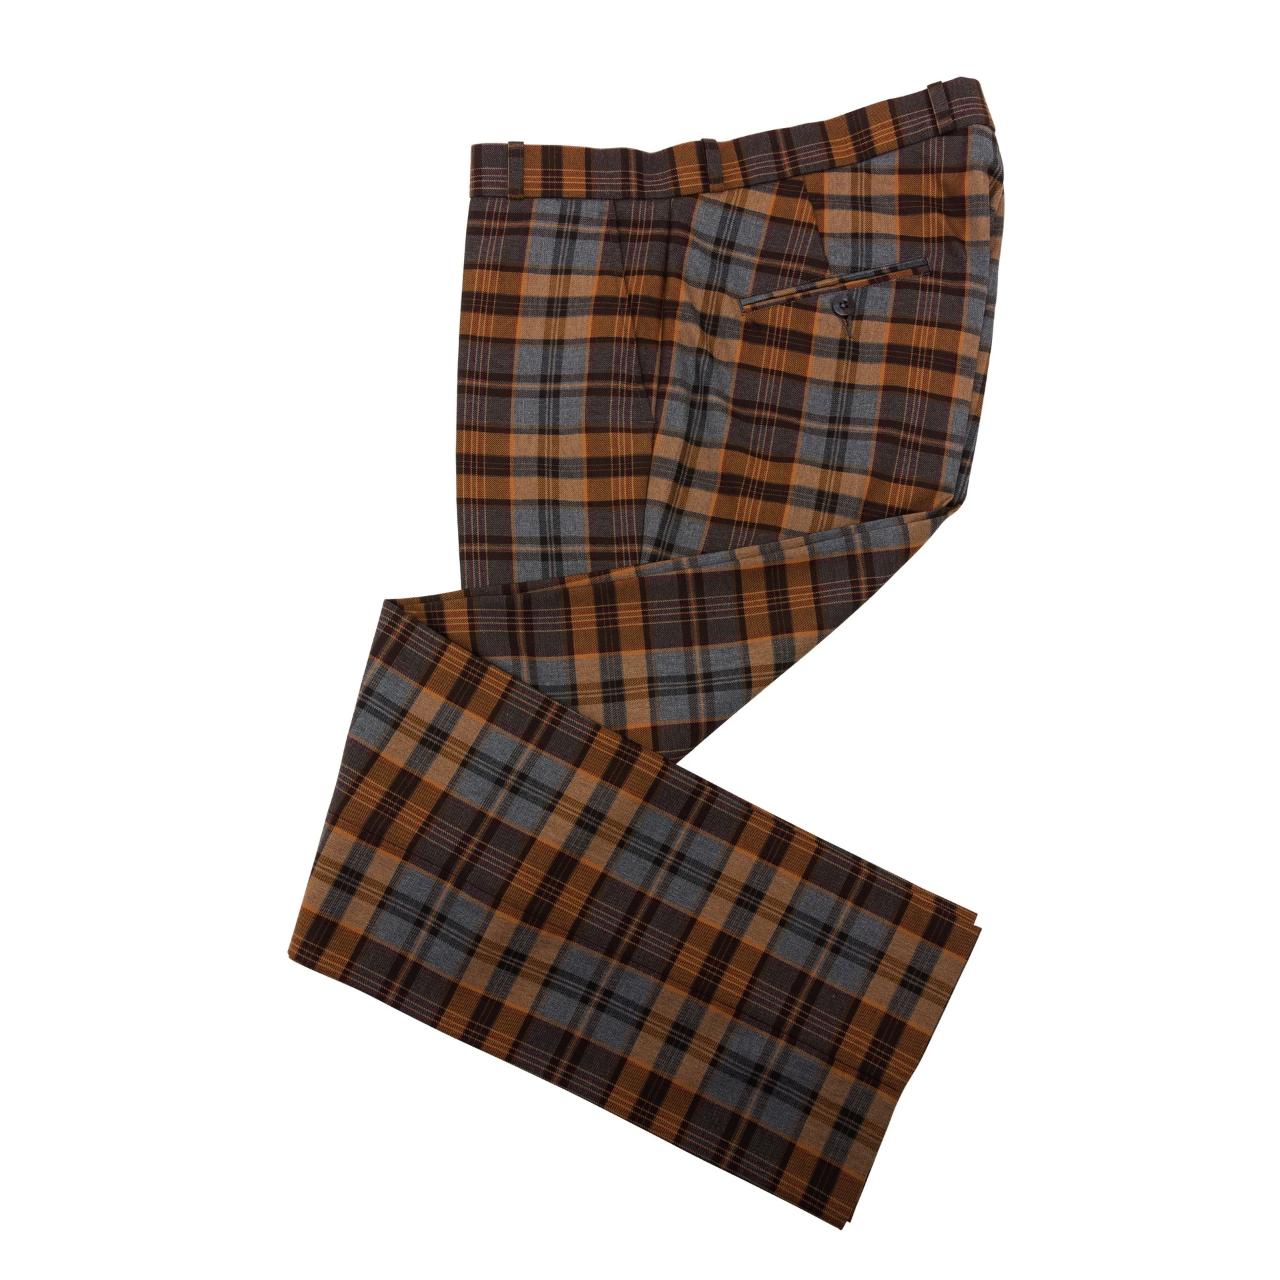 Relco London | Tartan Check Trousers - Brown×Grey